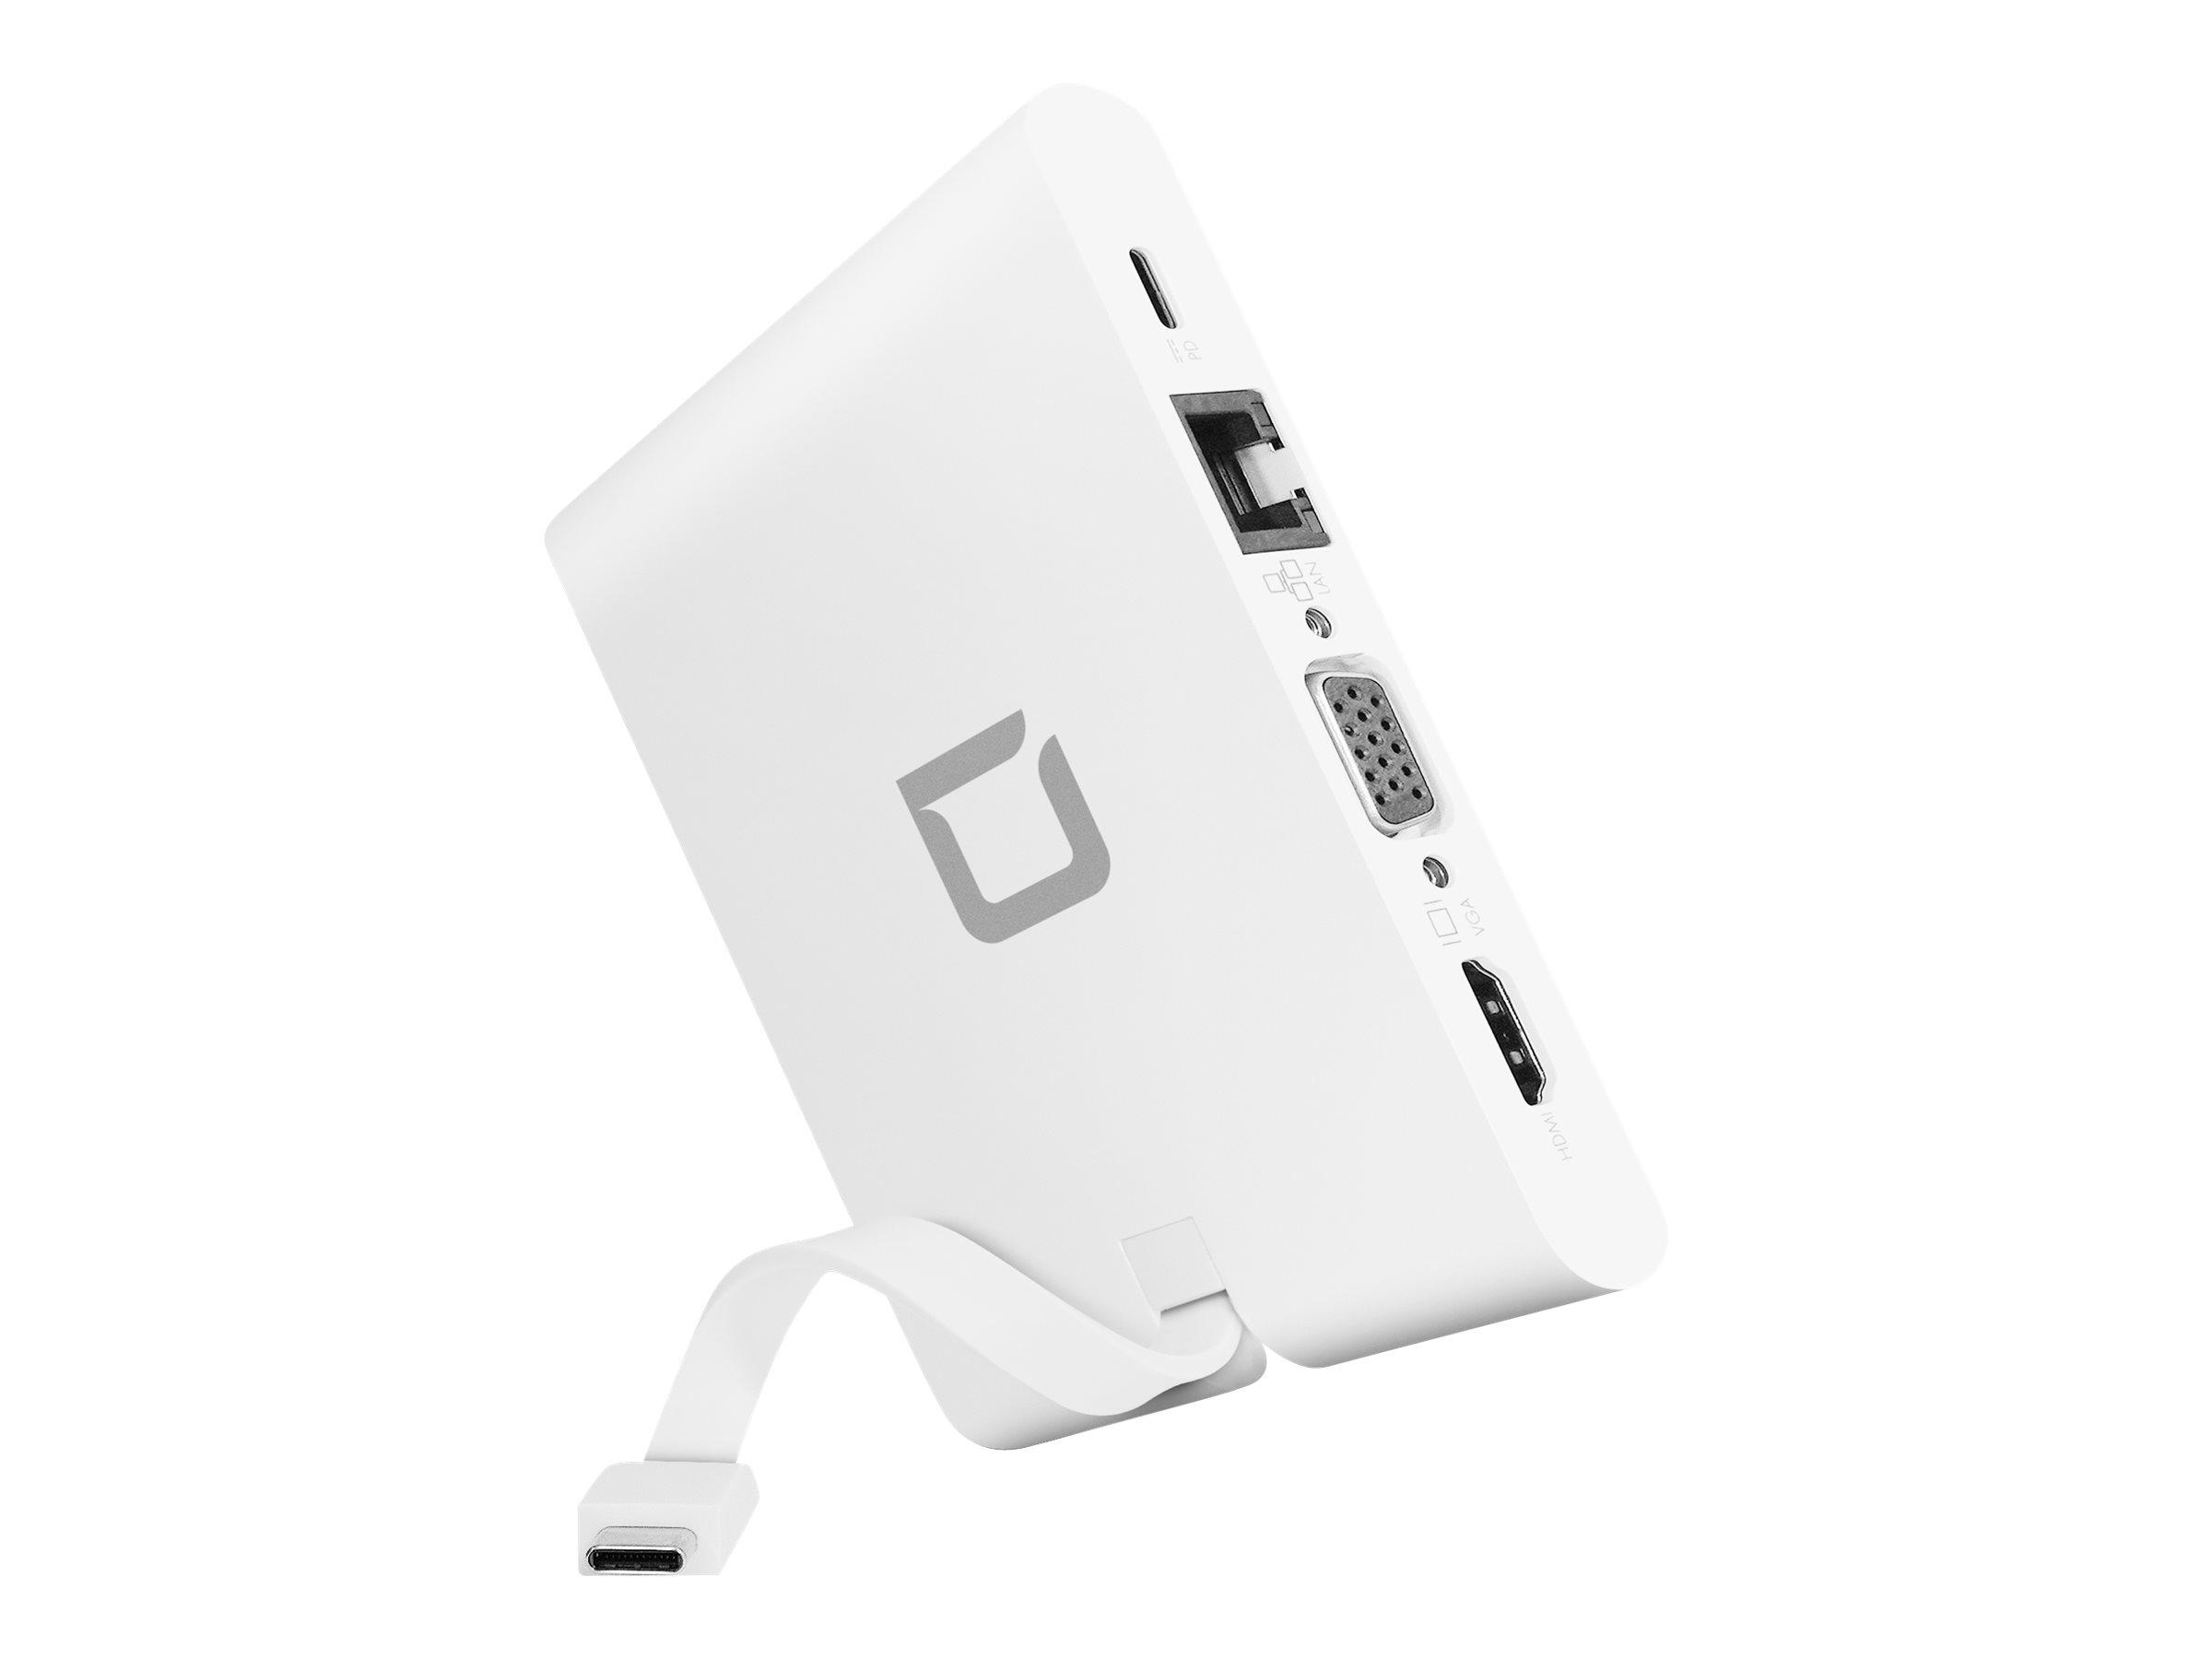 DICOTA USB-C Portable Docking 9-in-1 with HDMI - Dockingstation - USB-C - VGA, HDMI